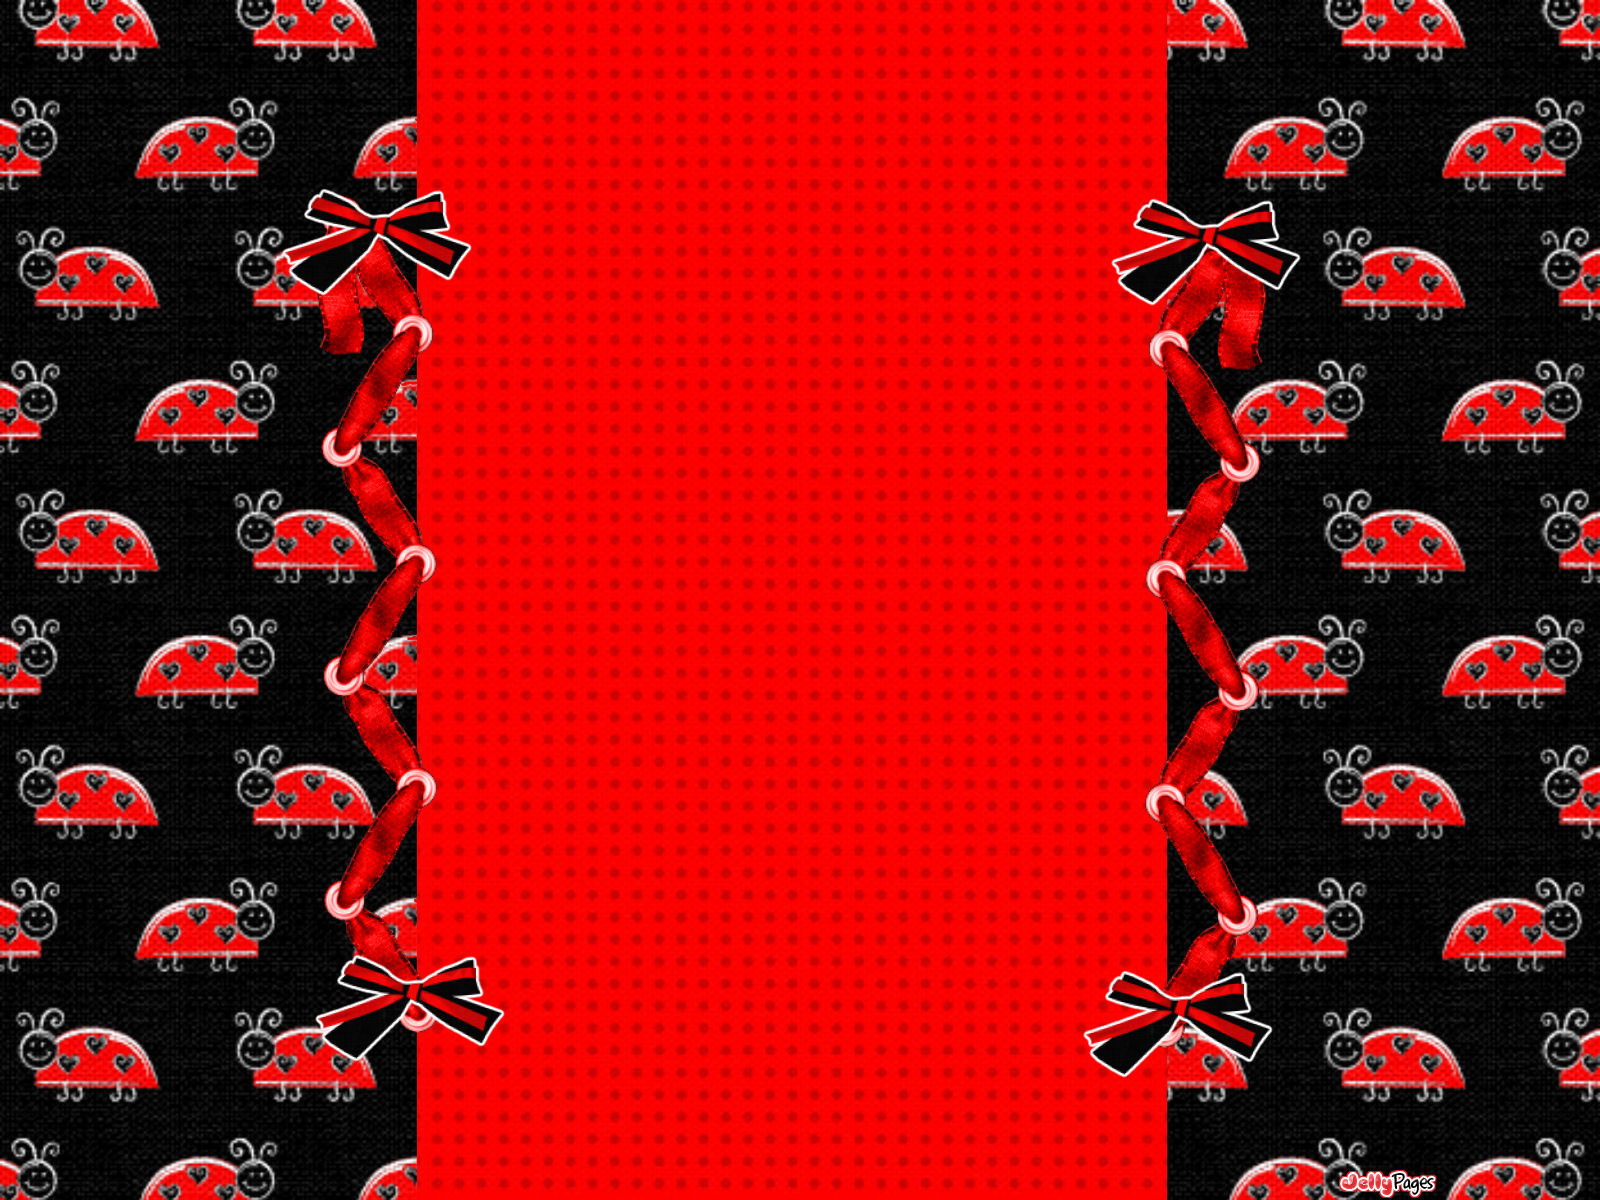 ladybug pattern wallpaper for desktop wallpapersafari